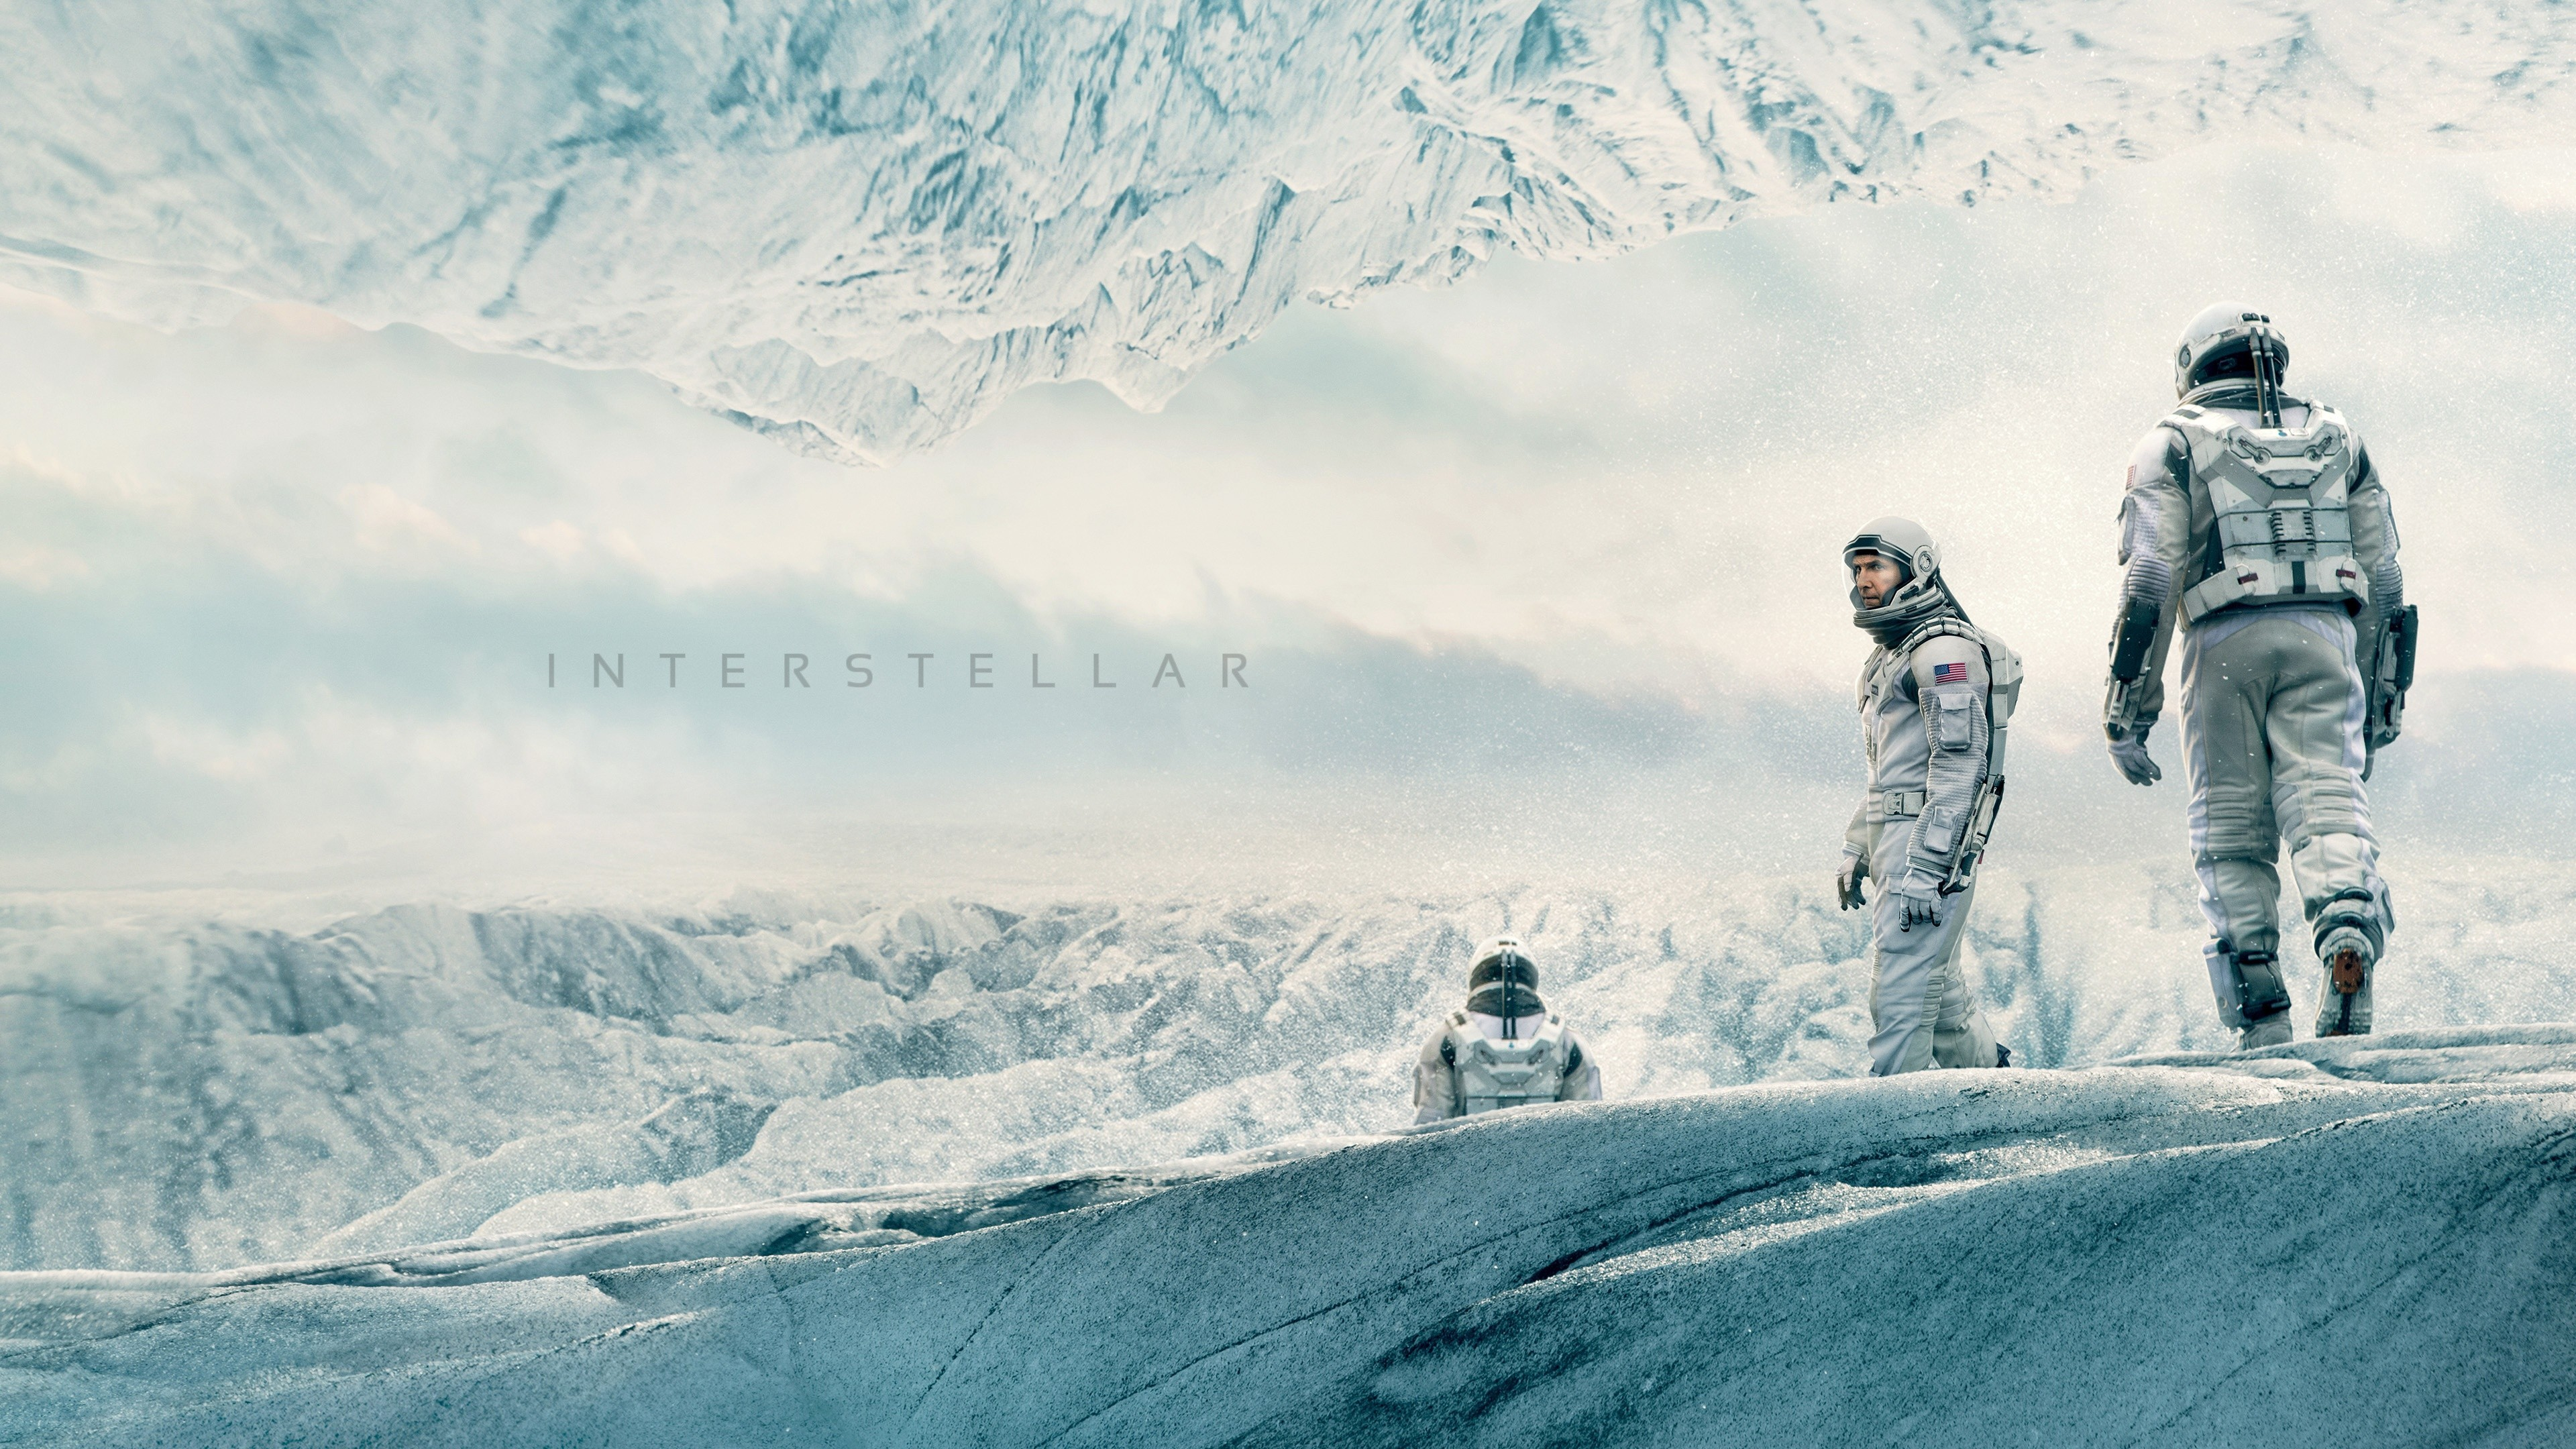 space, Interstellar (movie), Film Stills Wallpapers HD / Desktop and Mobile  Backgrounds